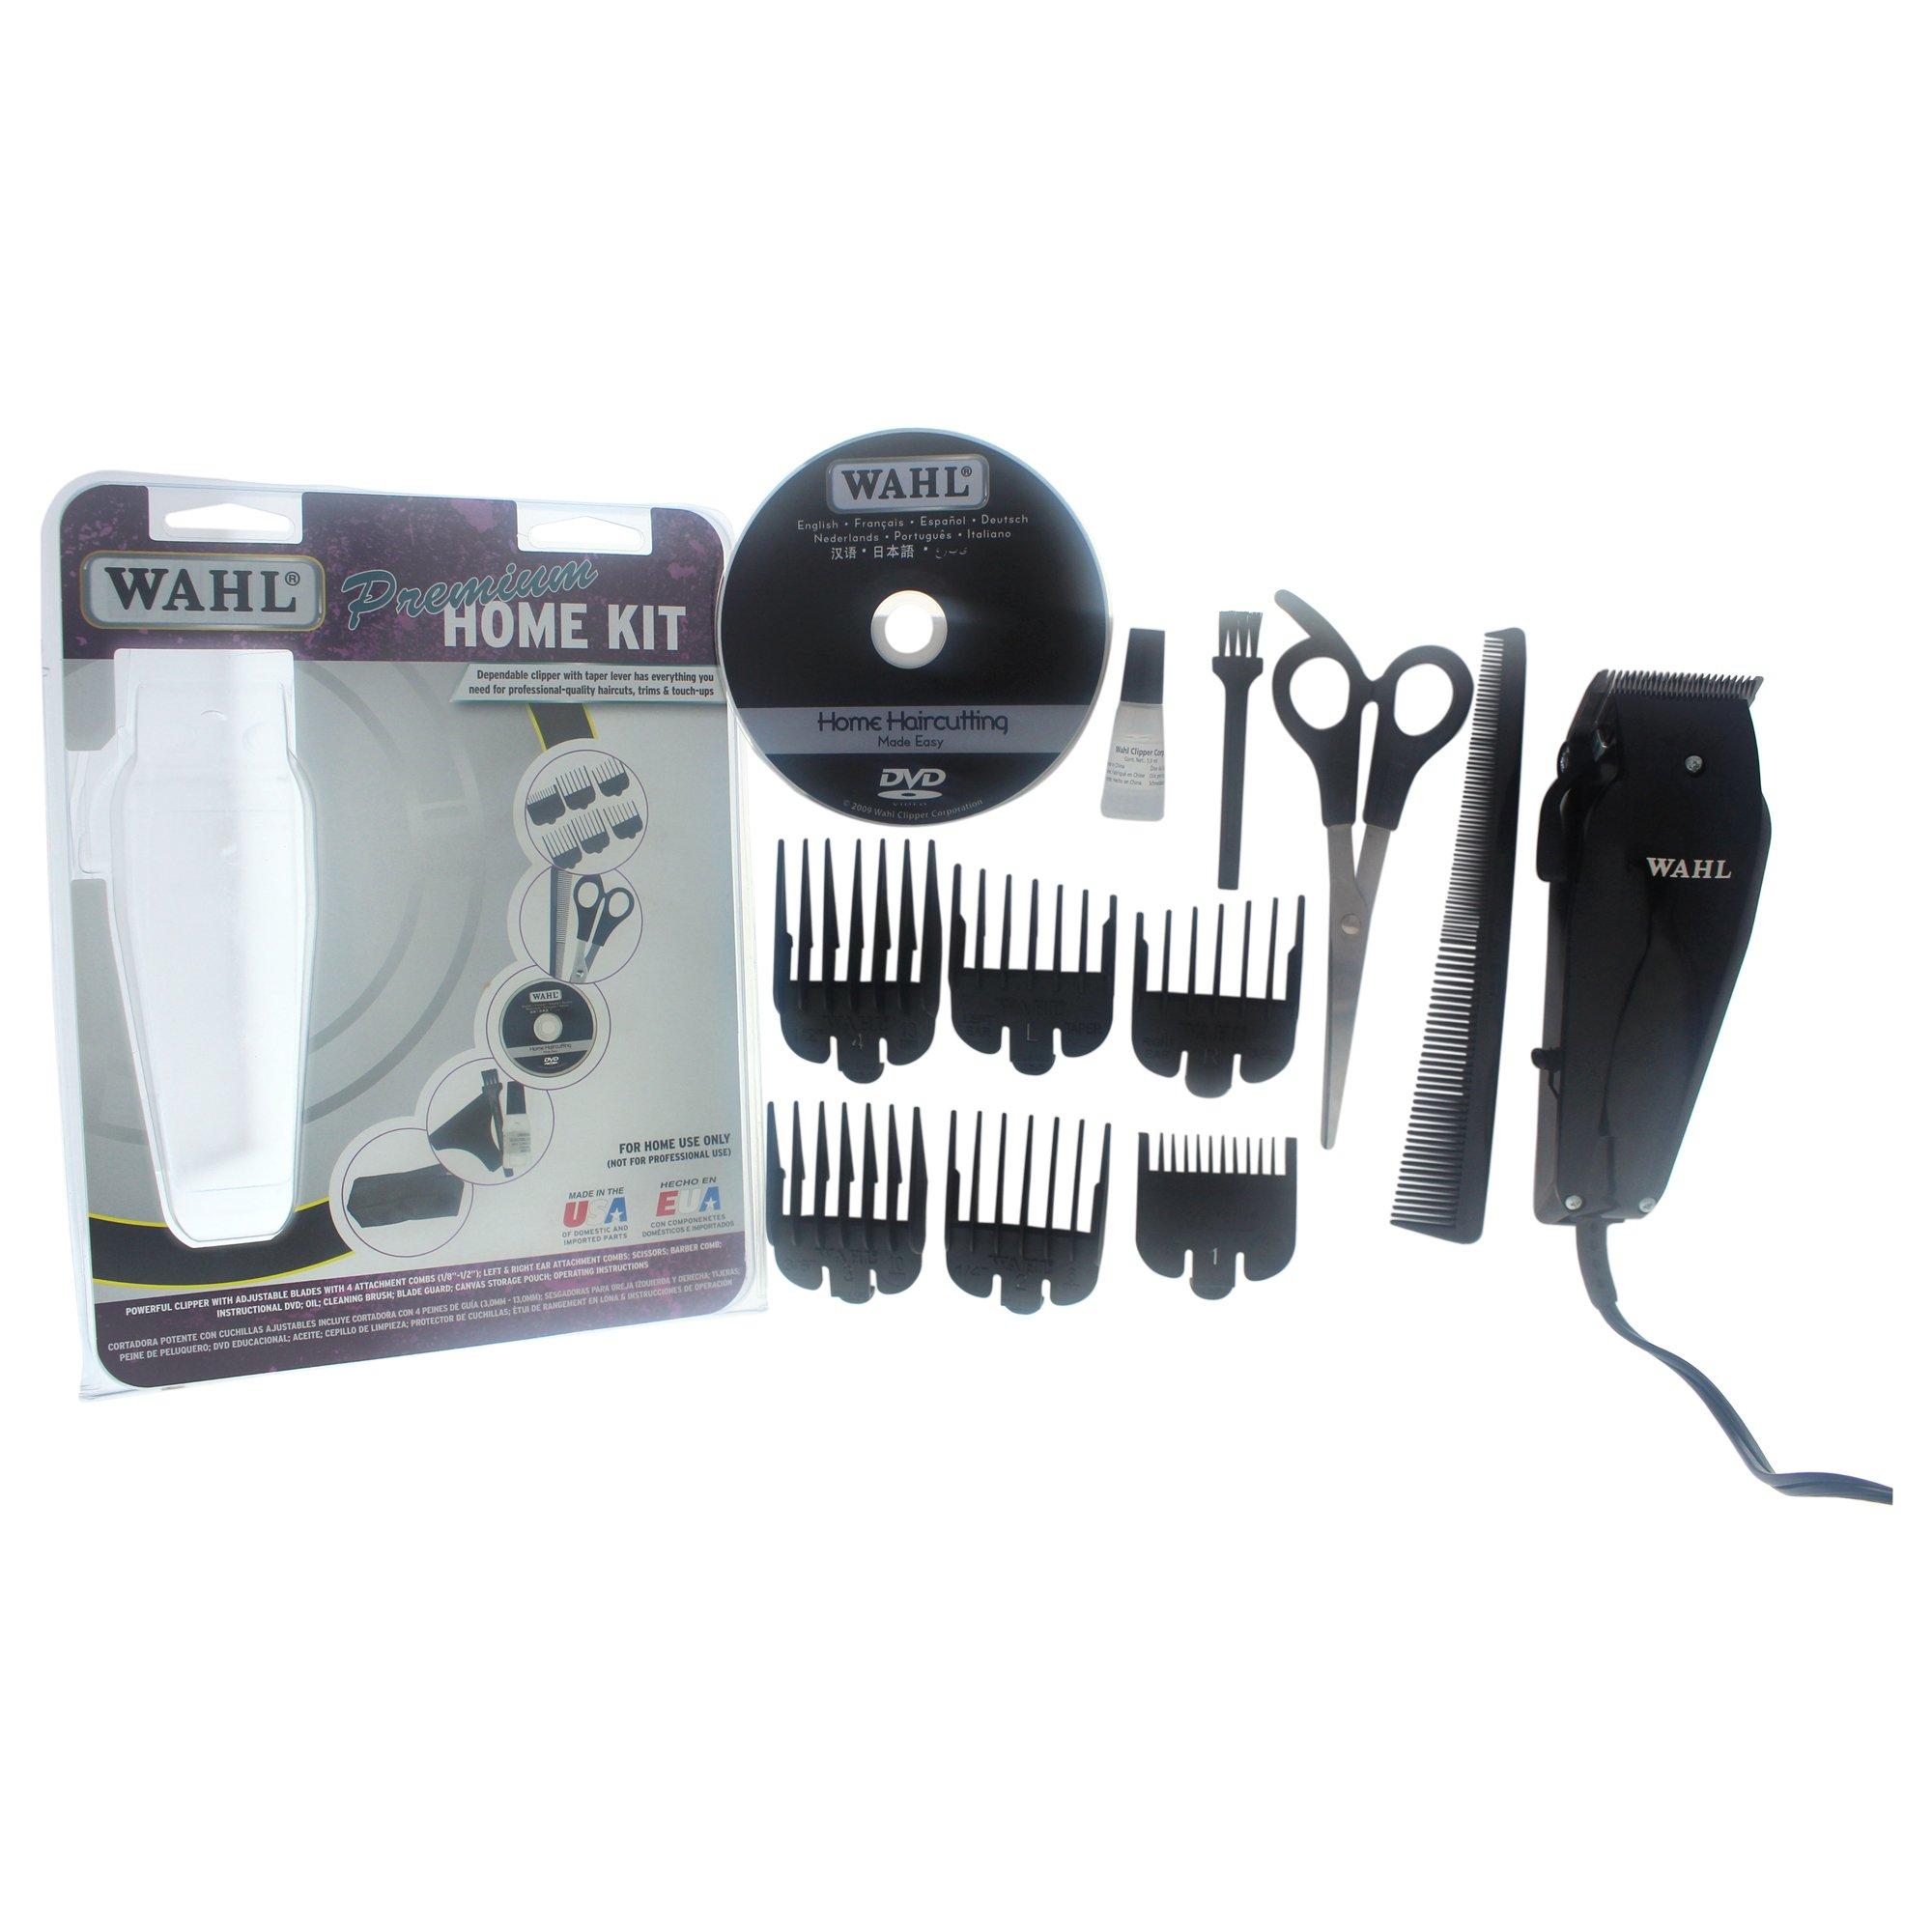 Wahl Premium Home Kit